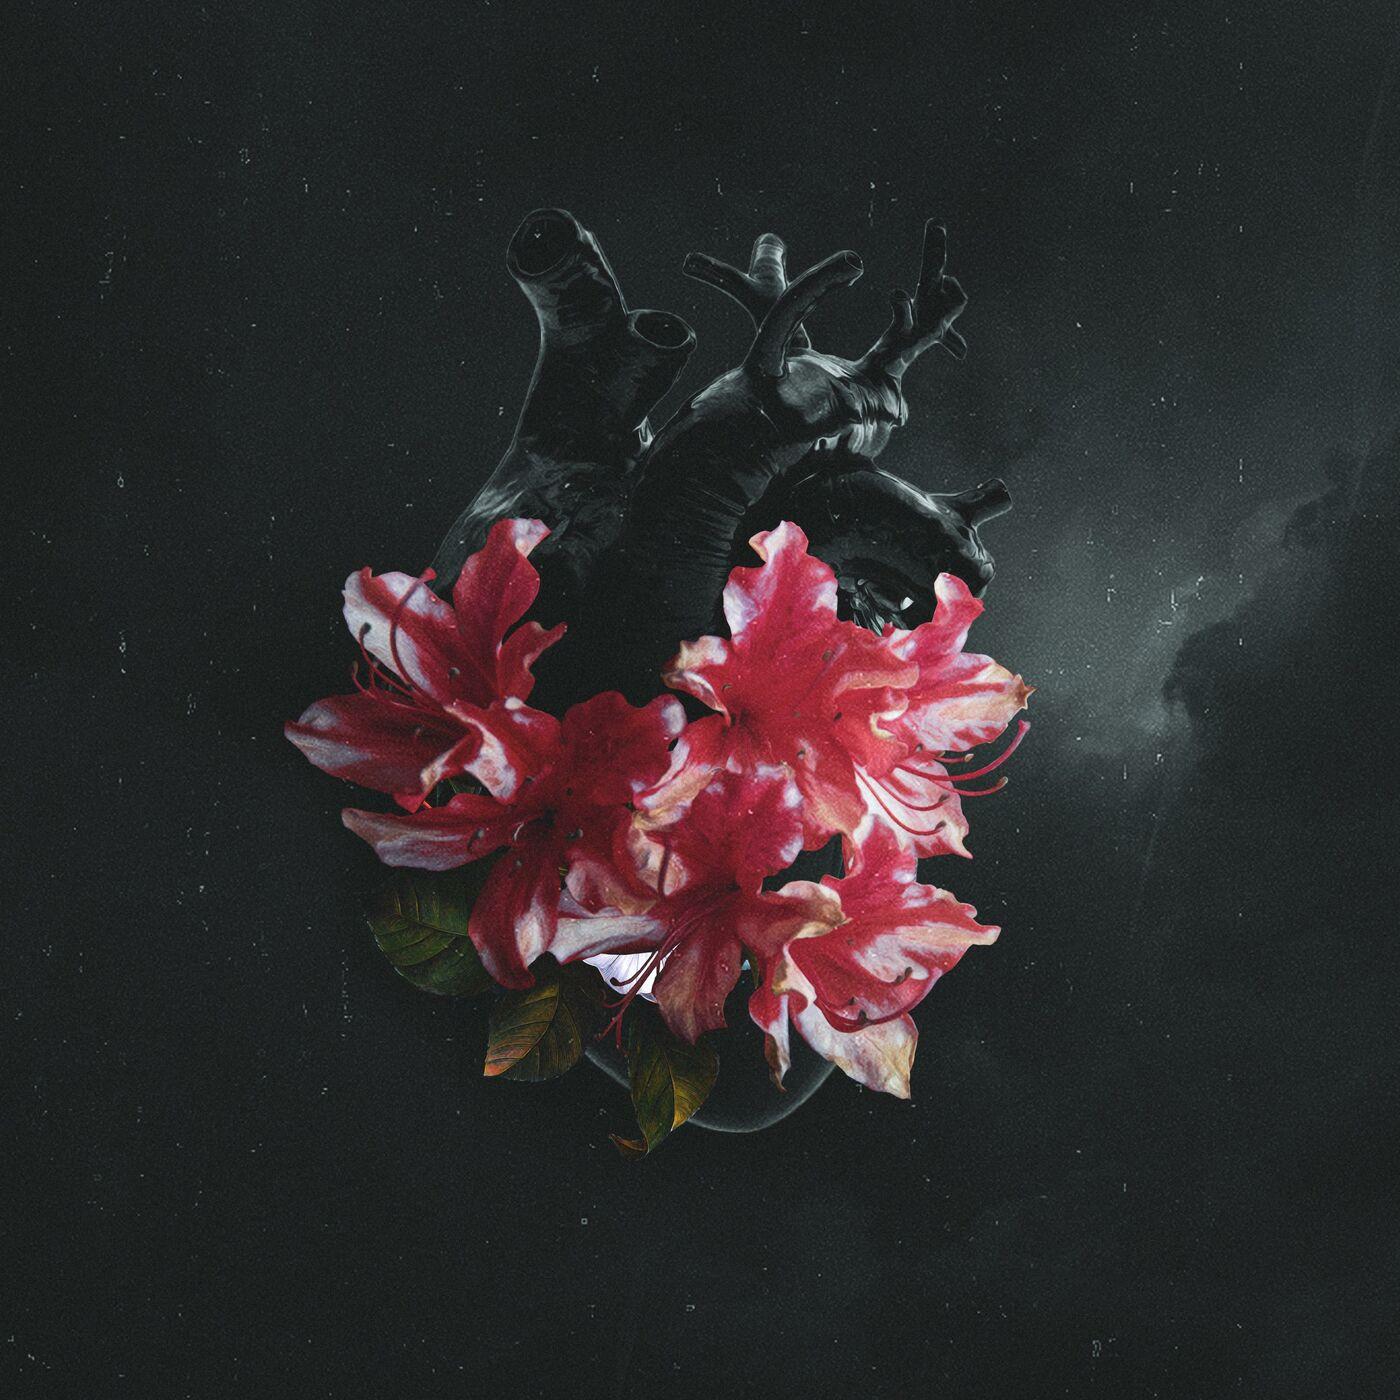 Instilled in Me - Stripped Away [single] (2019)